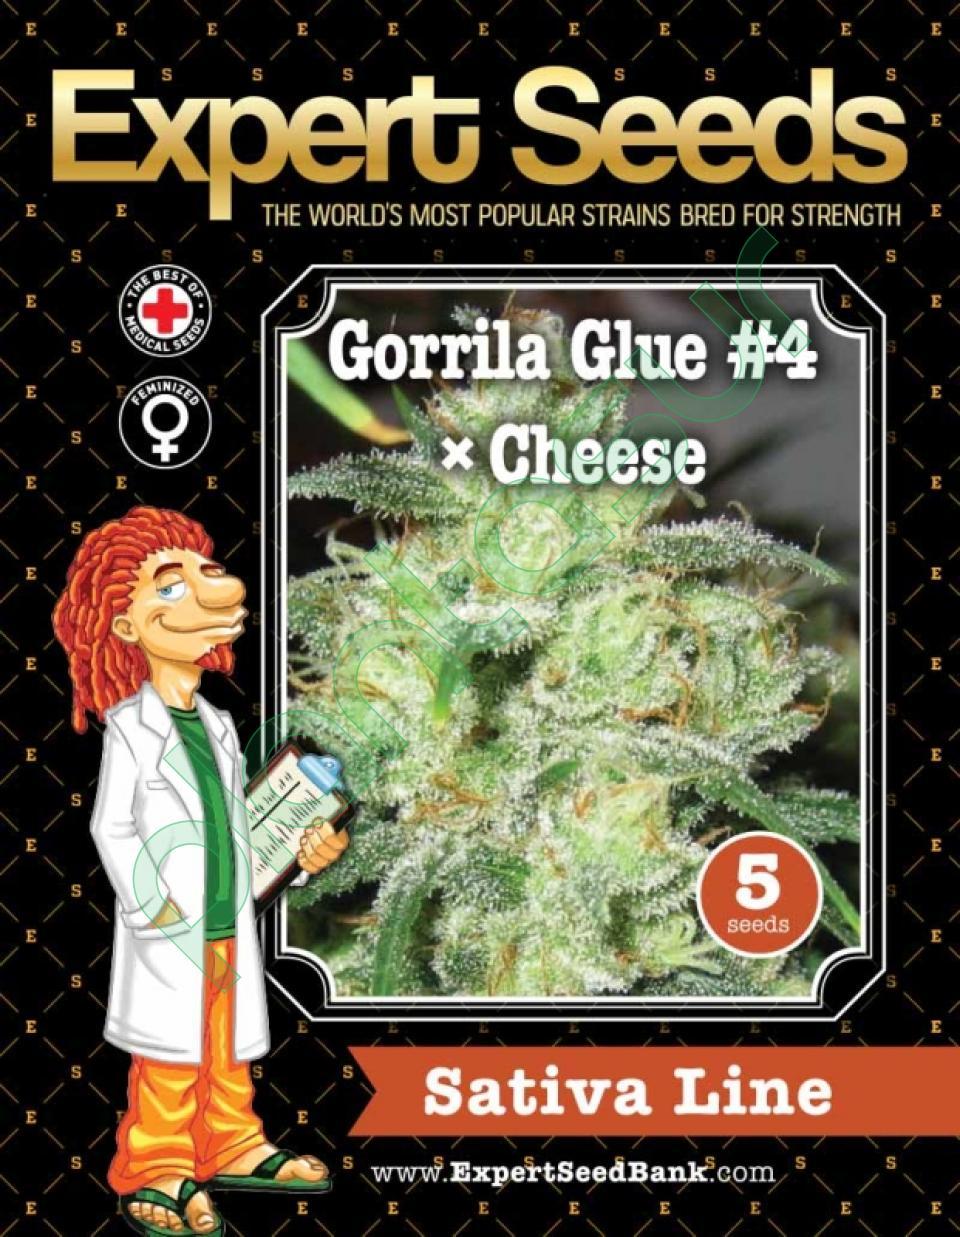 5 FEM SEEDS - GORILLA GLUE # 4 X CHEESE   Plantasur, distribución al